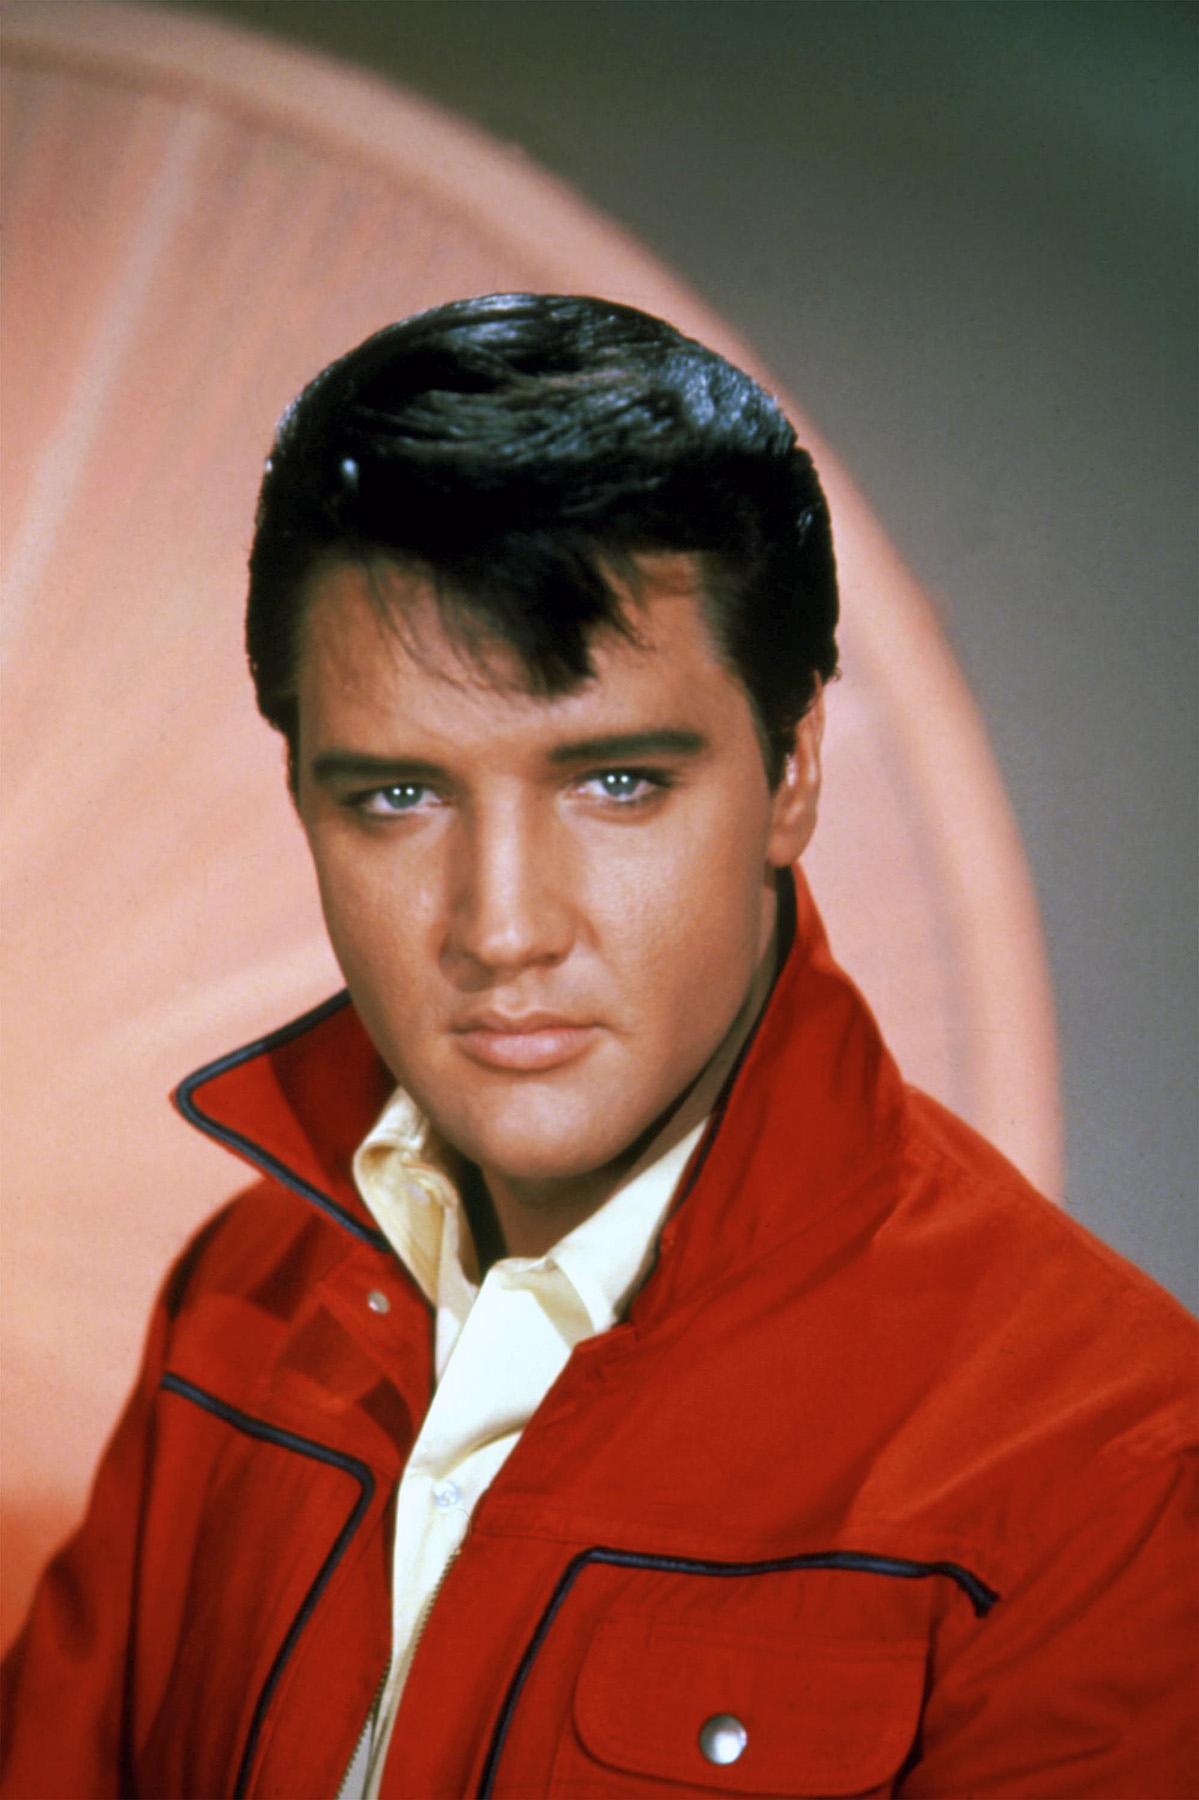 Elvis Presley Original Soundtrack Recordings From His NBC TV Special